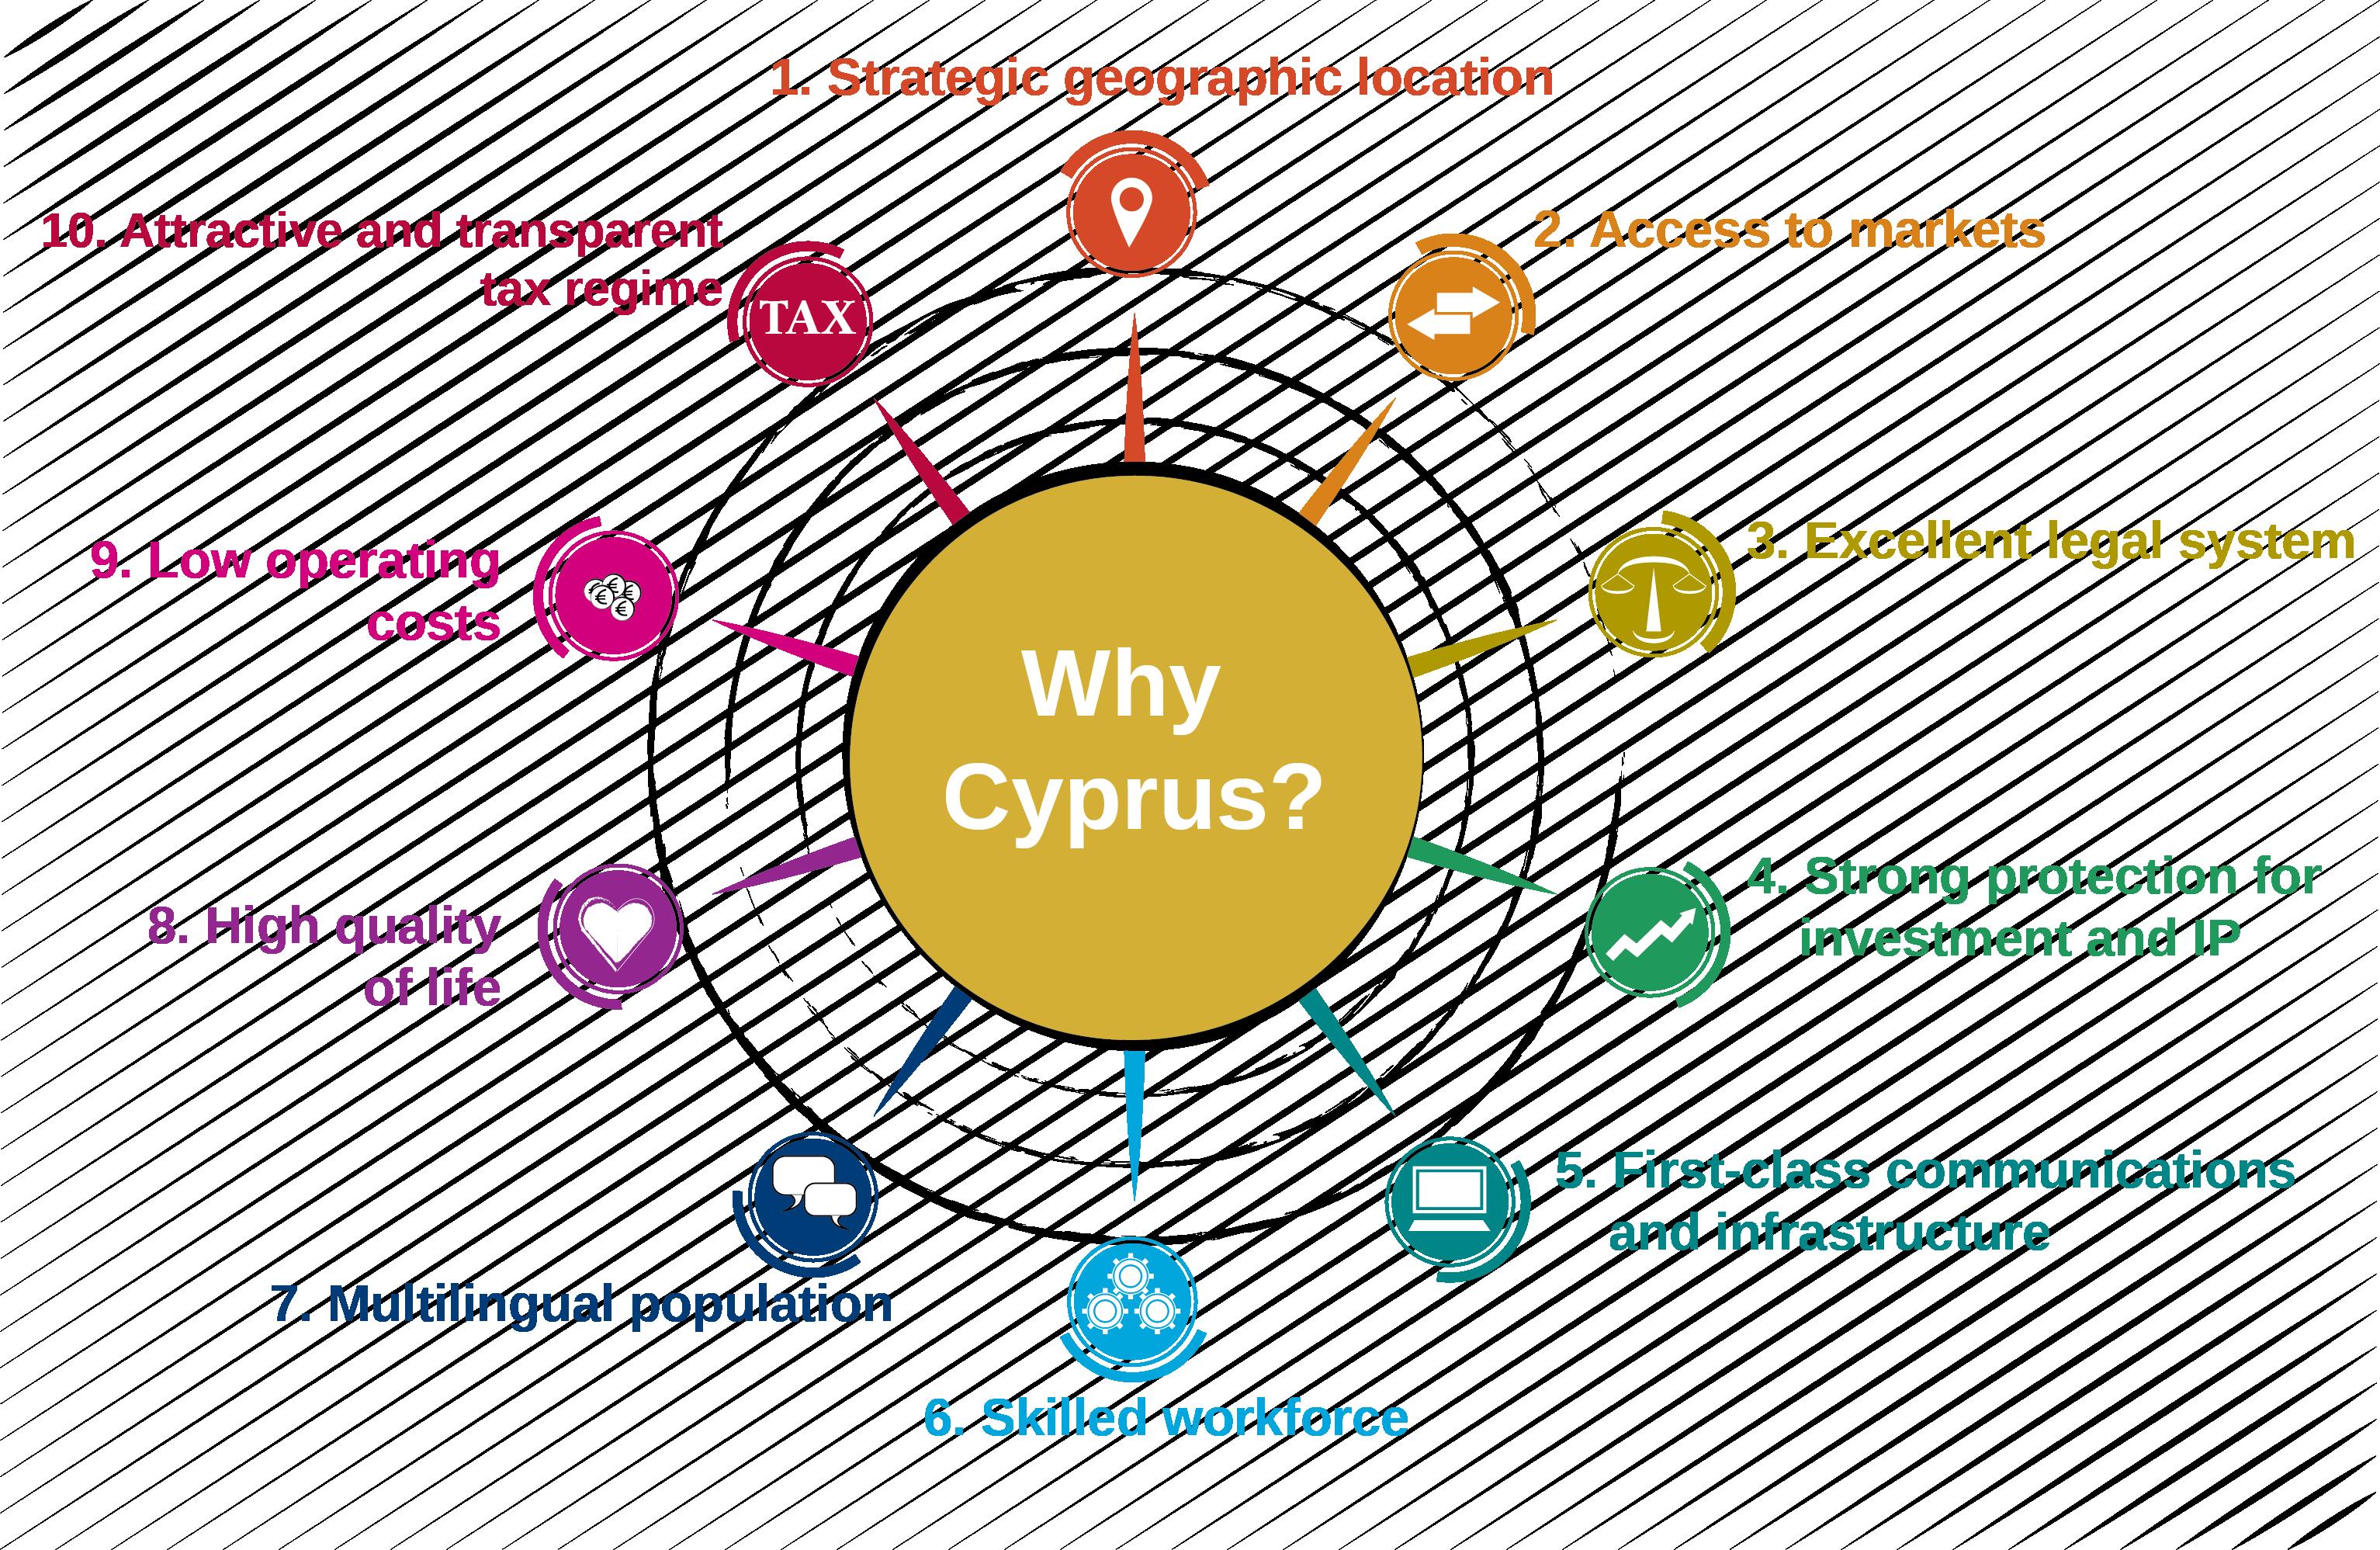 WHY CYPRUS